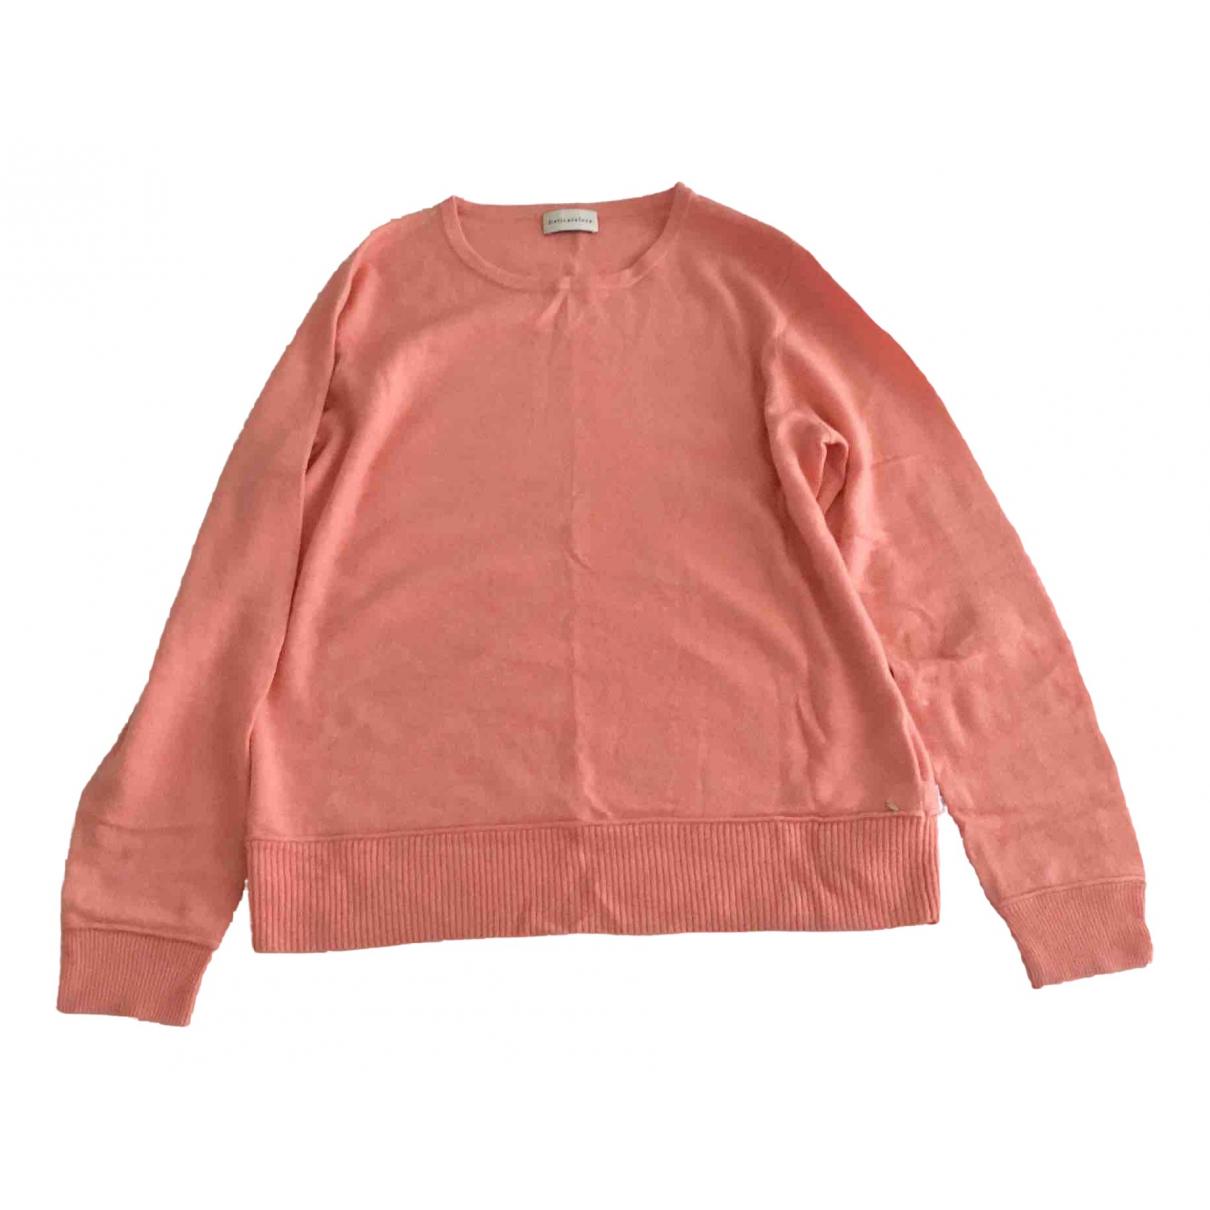 Delicatelove - Pull   pour femme en laine - rose